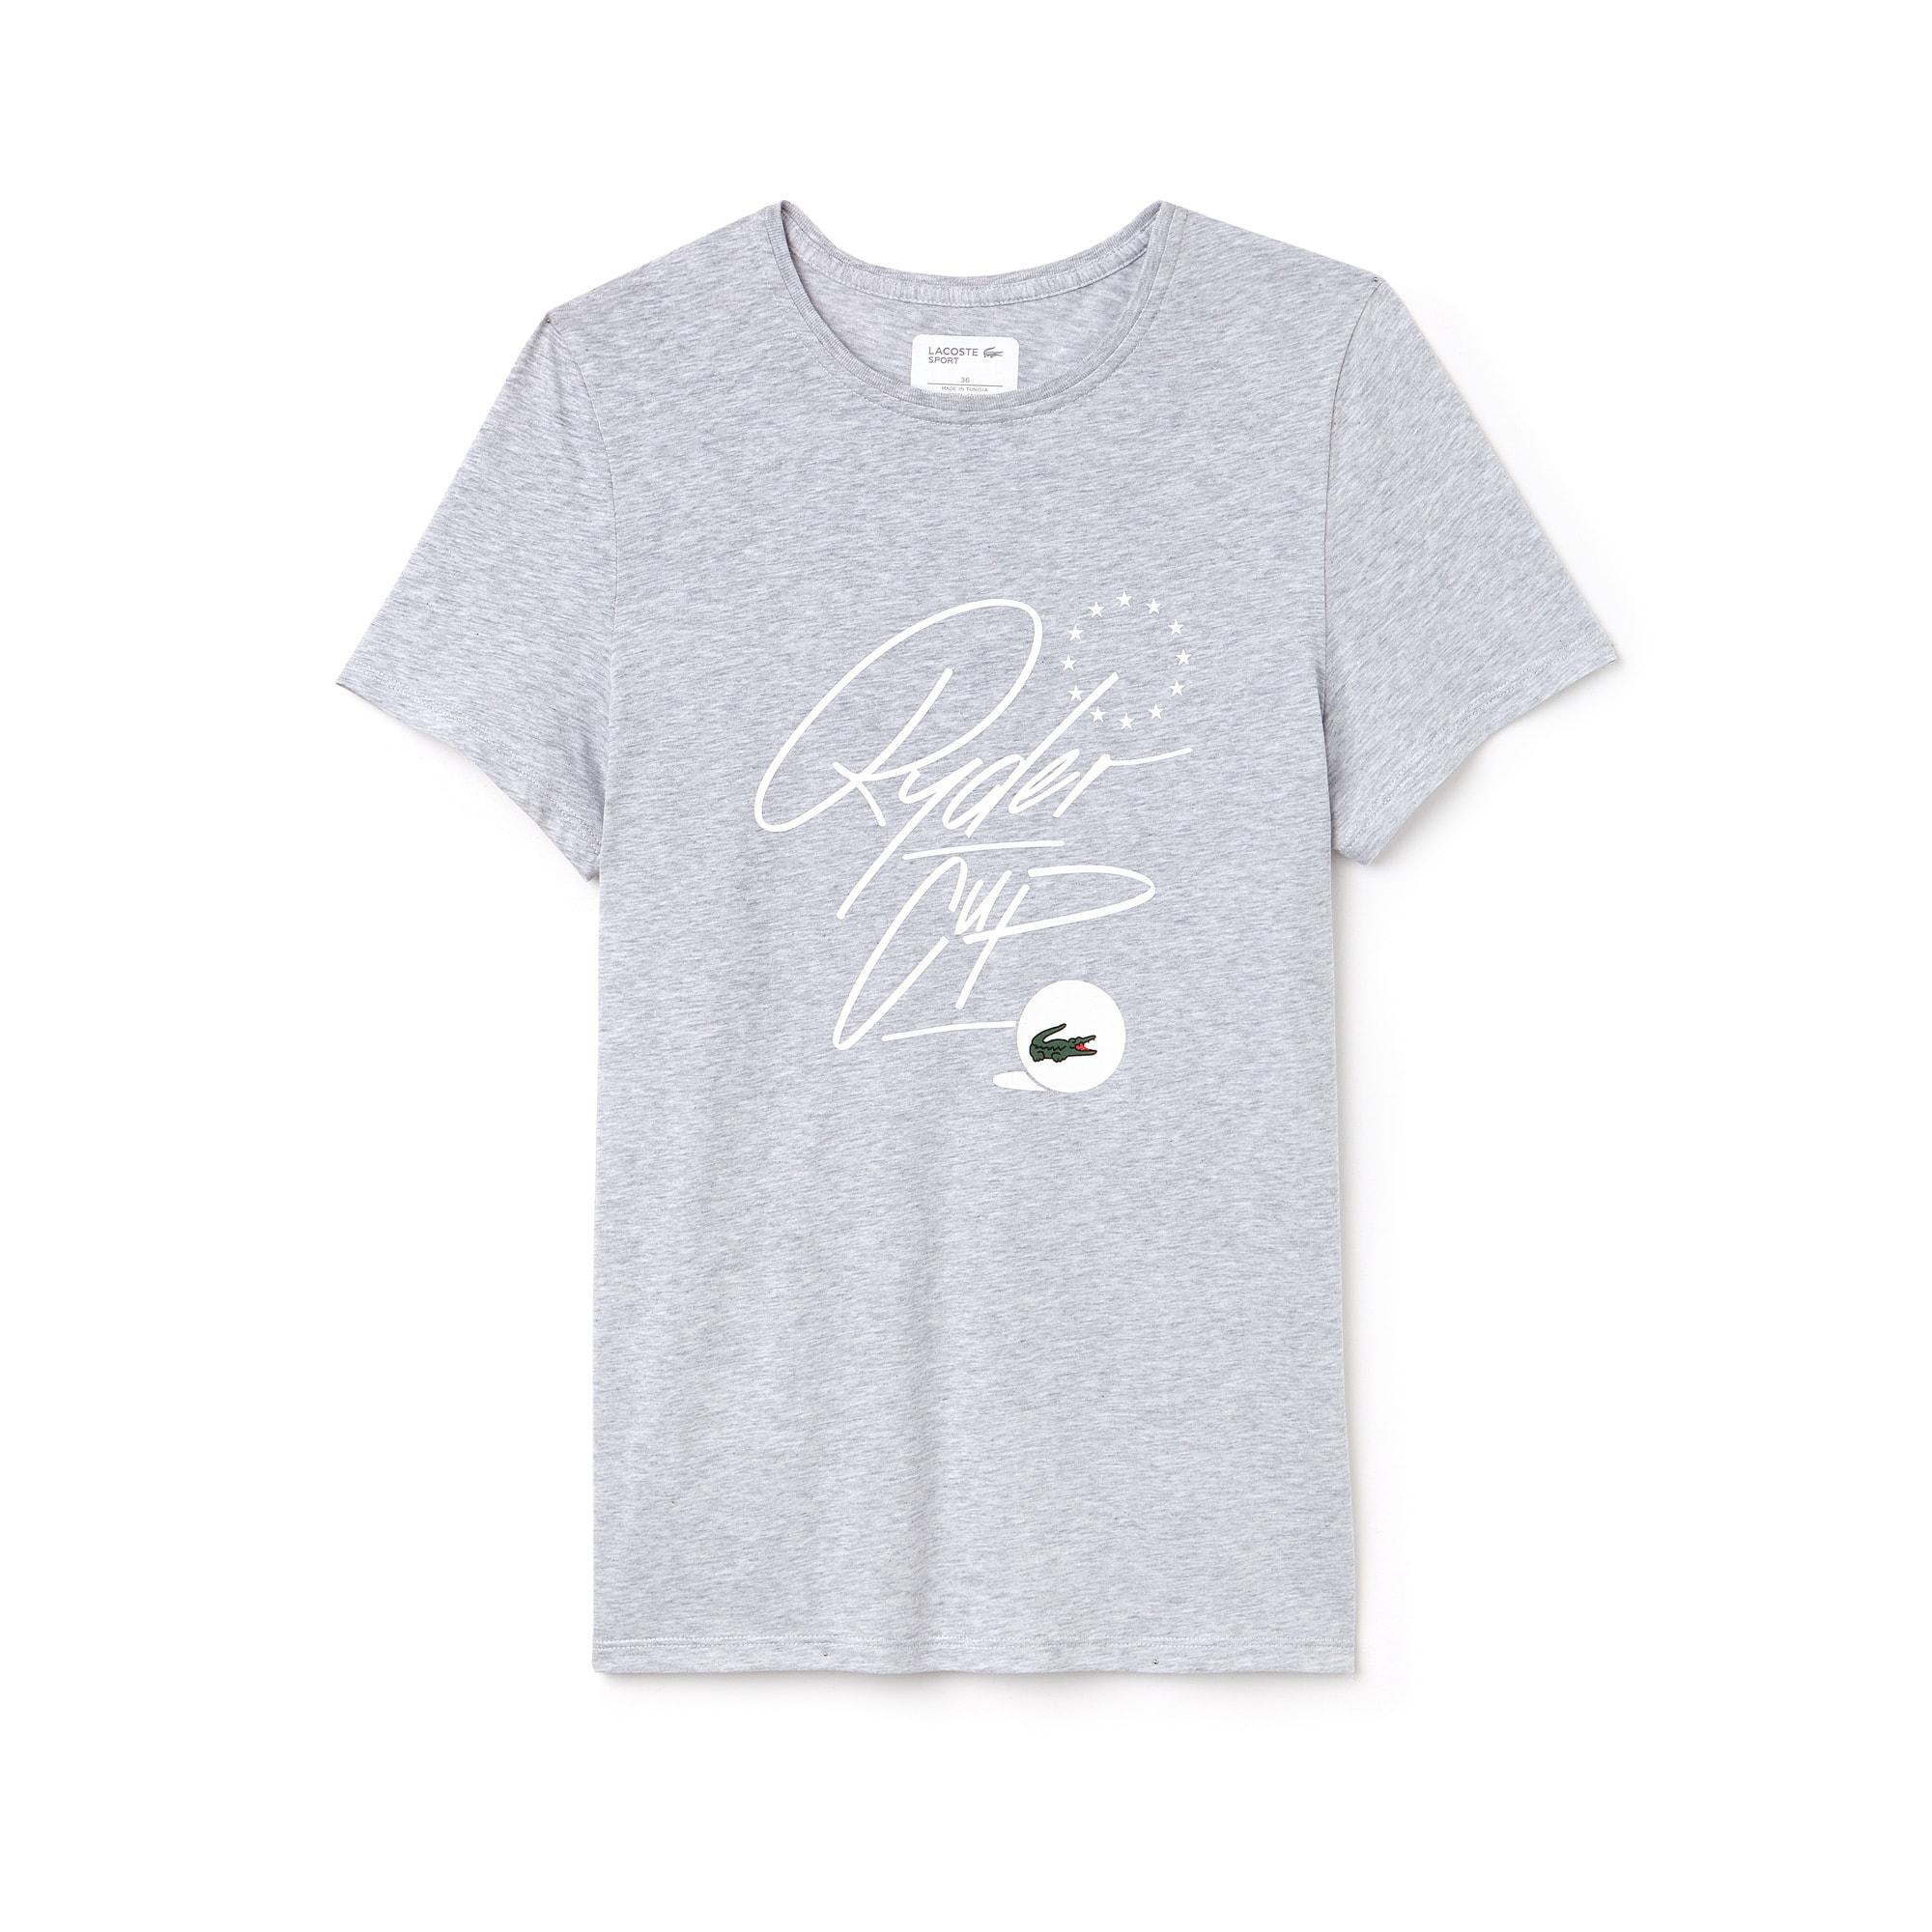 Women's Lacoste SPORT Ryder Cup Edition Jersey Golf T-shirt